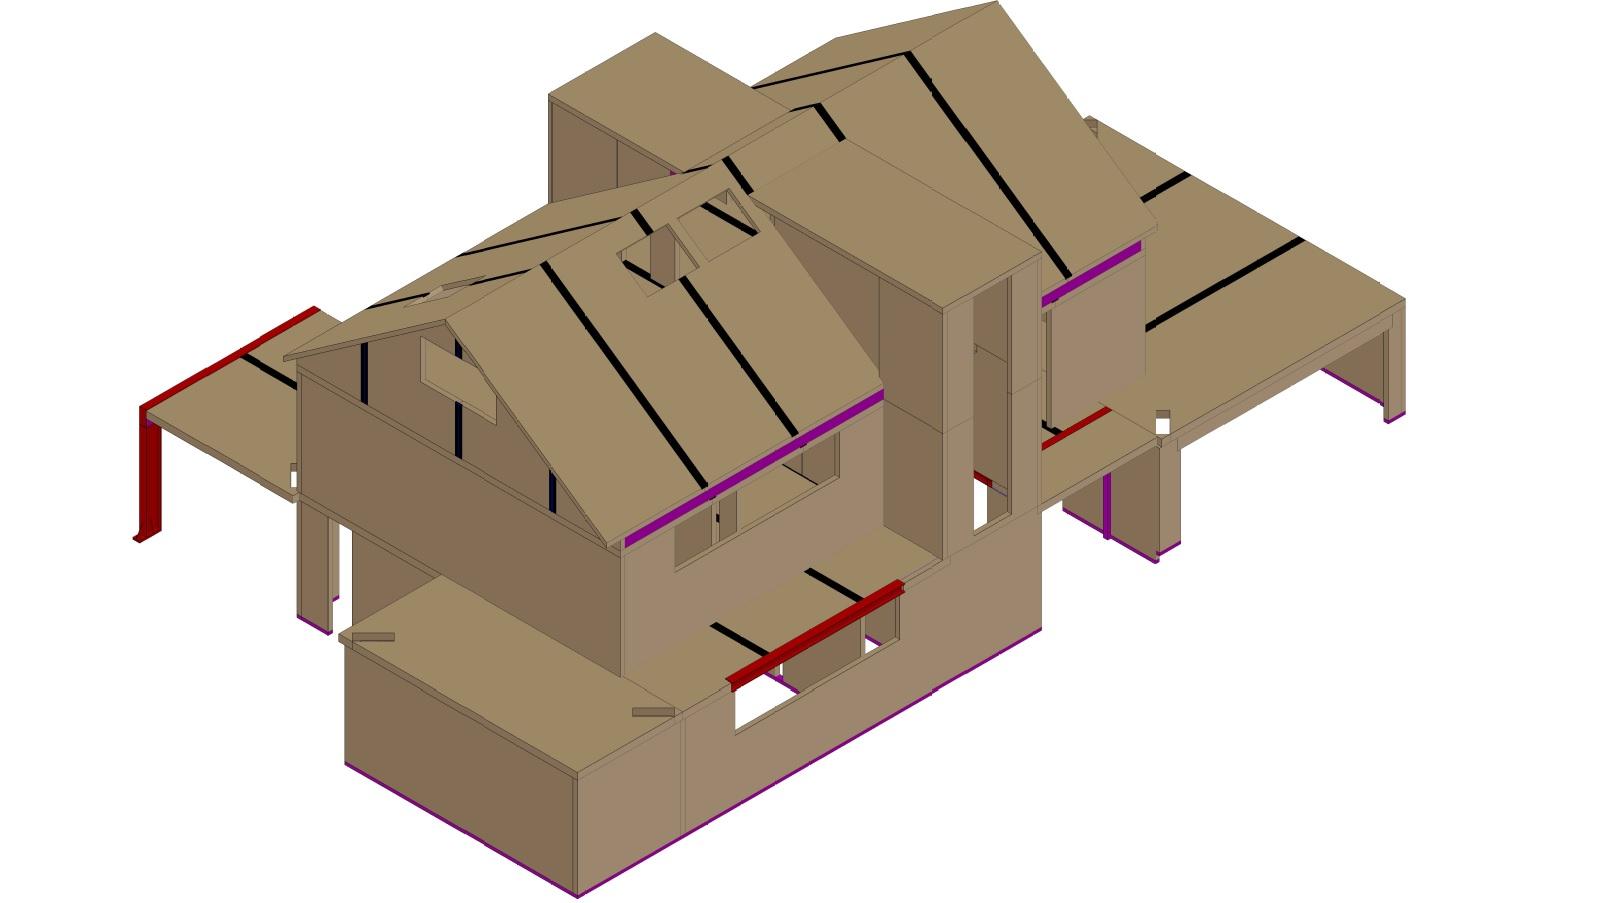 Holzhausbau mit Brettsperrholz | bei Holz-Hauff GmbH in Leingarten